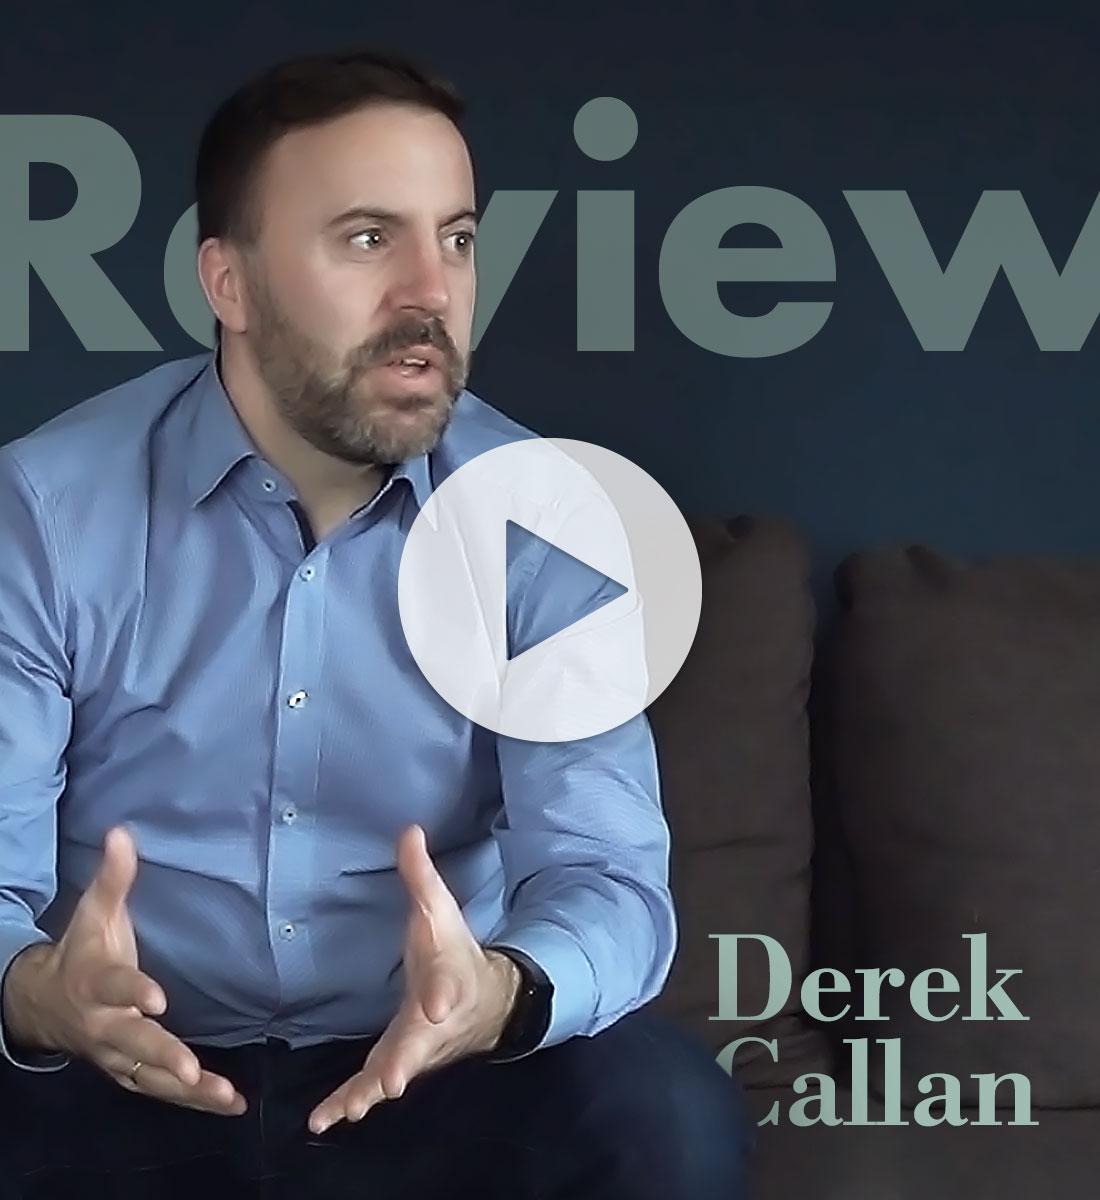 Derek Callan Testimonial Referenz mindly Design